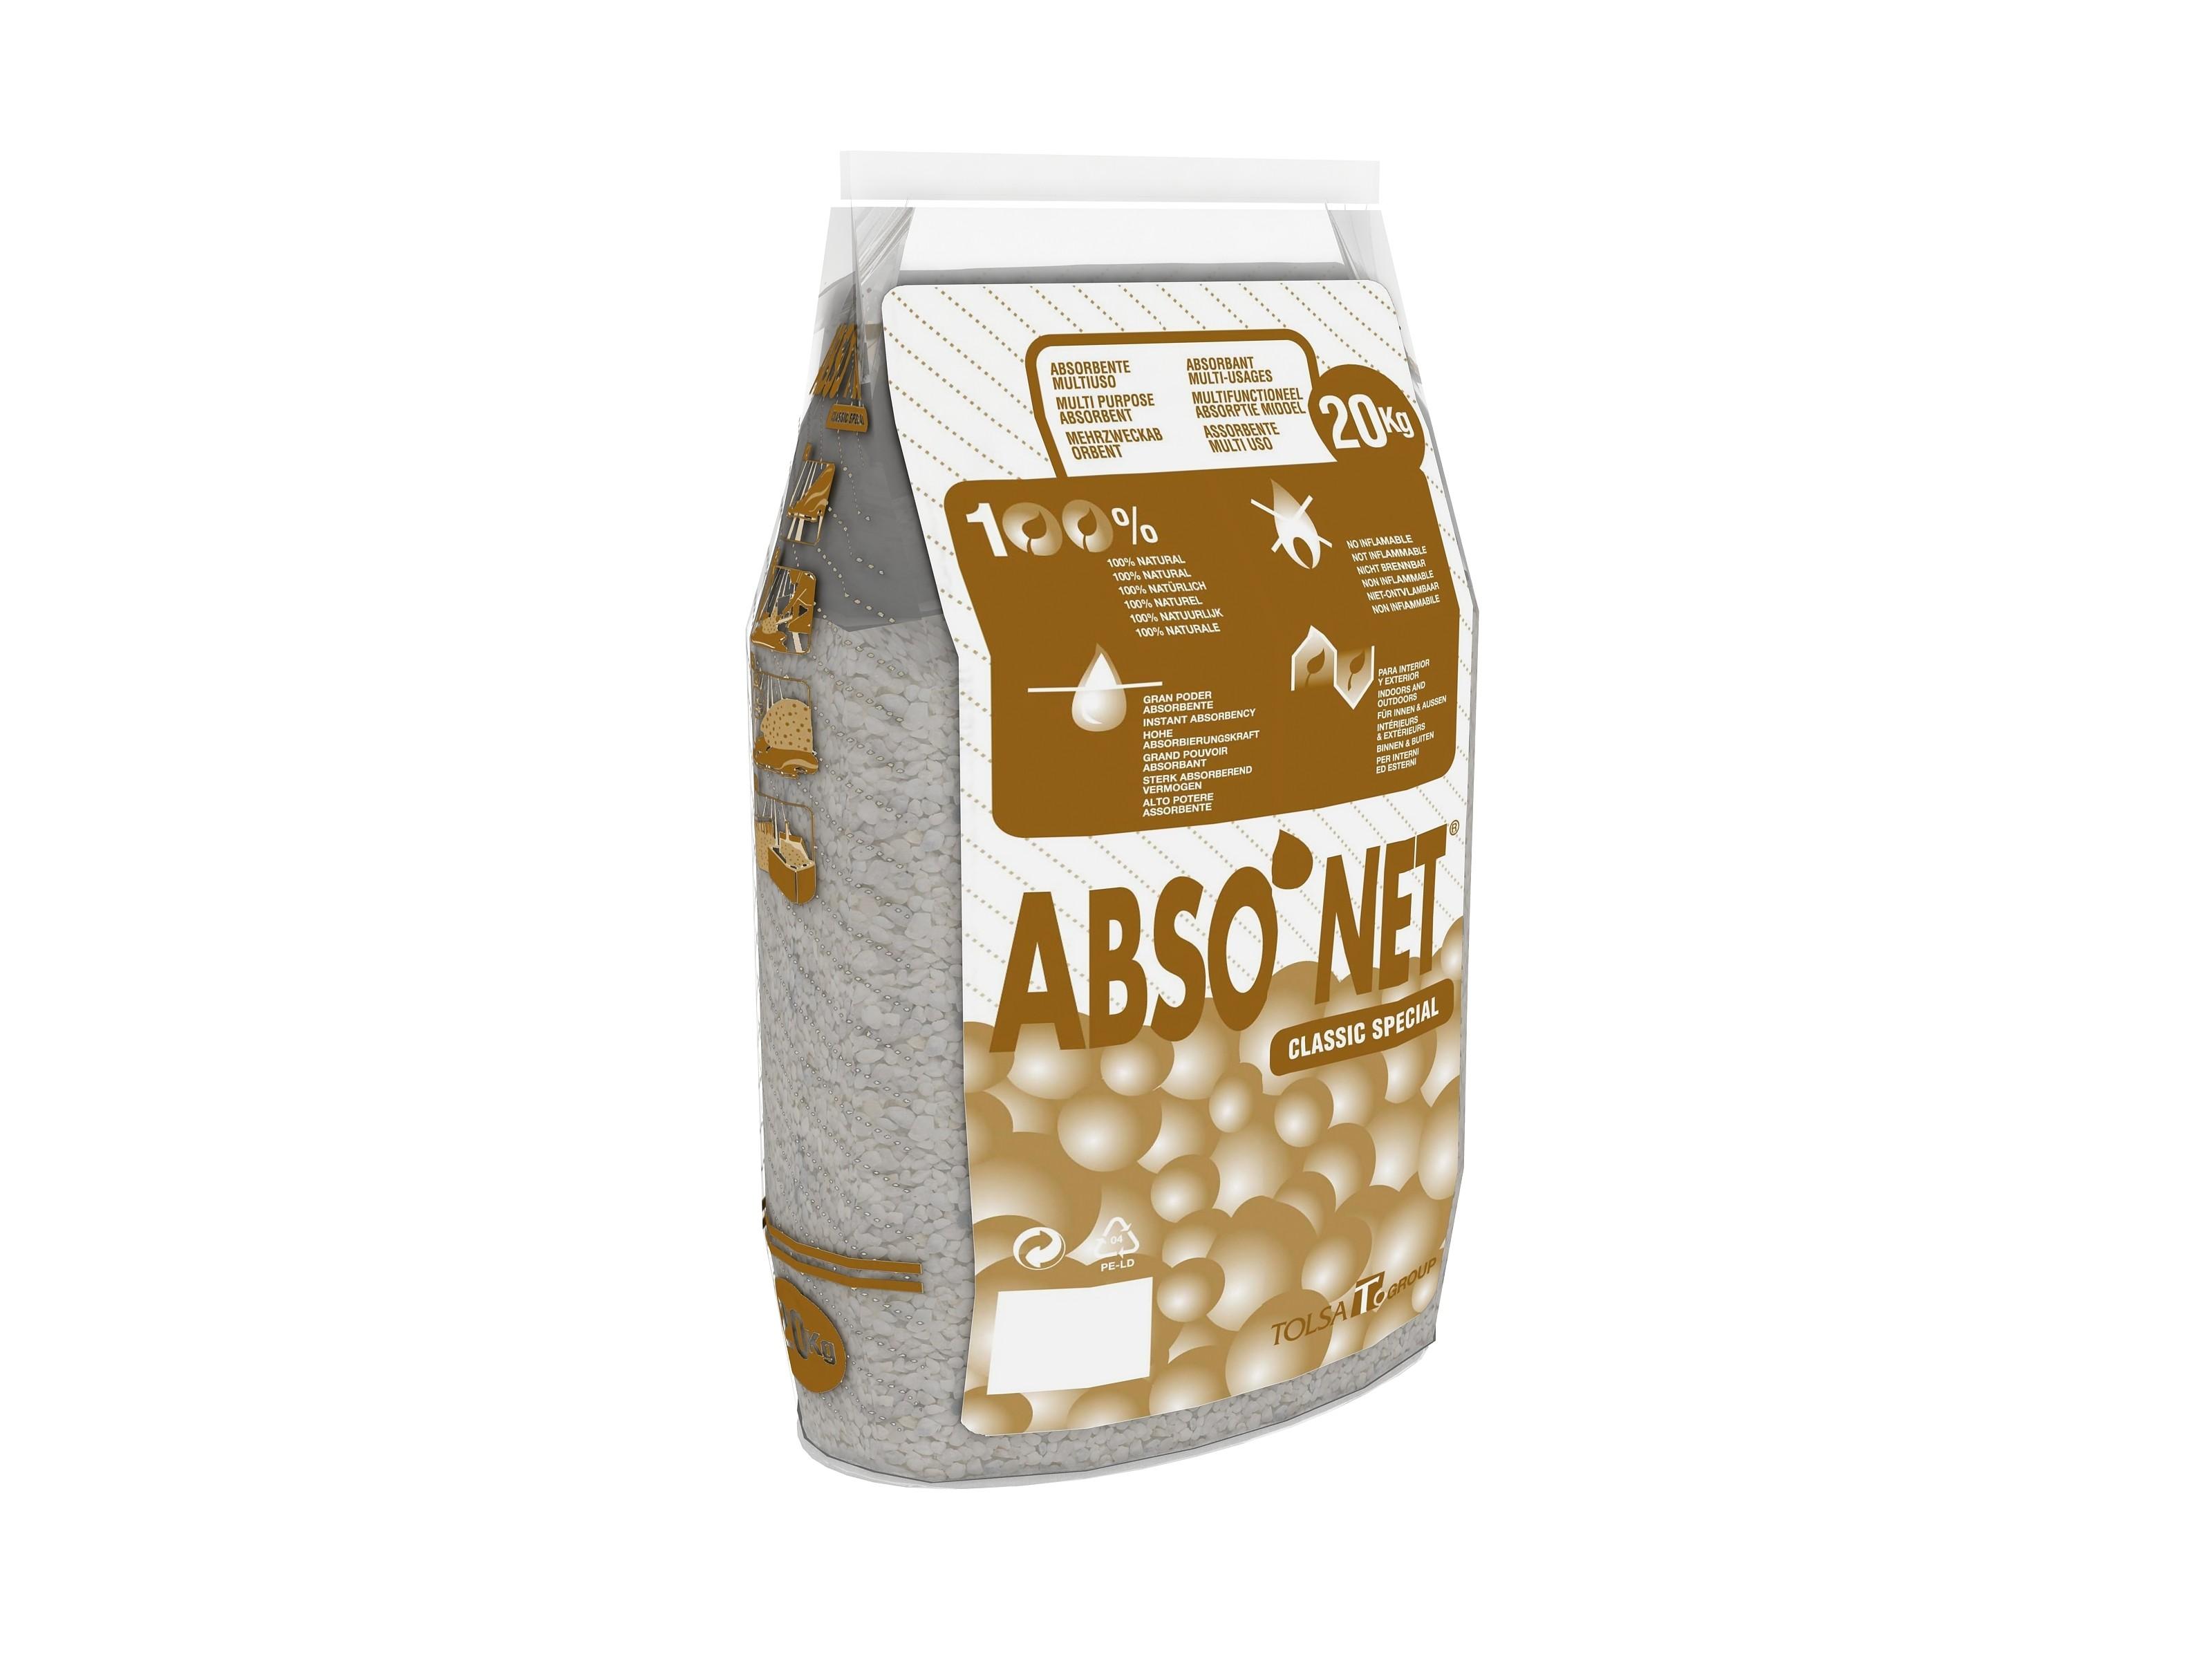 SEPIOLITE GRAIN FIN – ABSONET CLASSIC SPECIAL 20 Kg